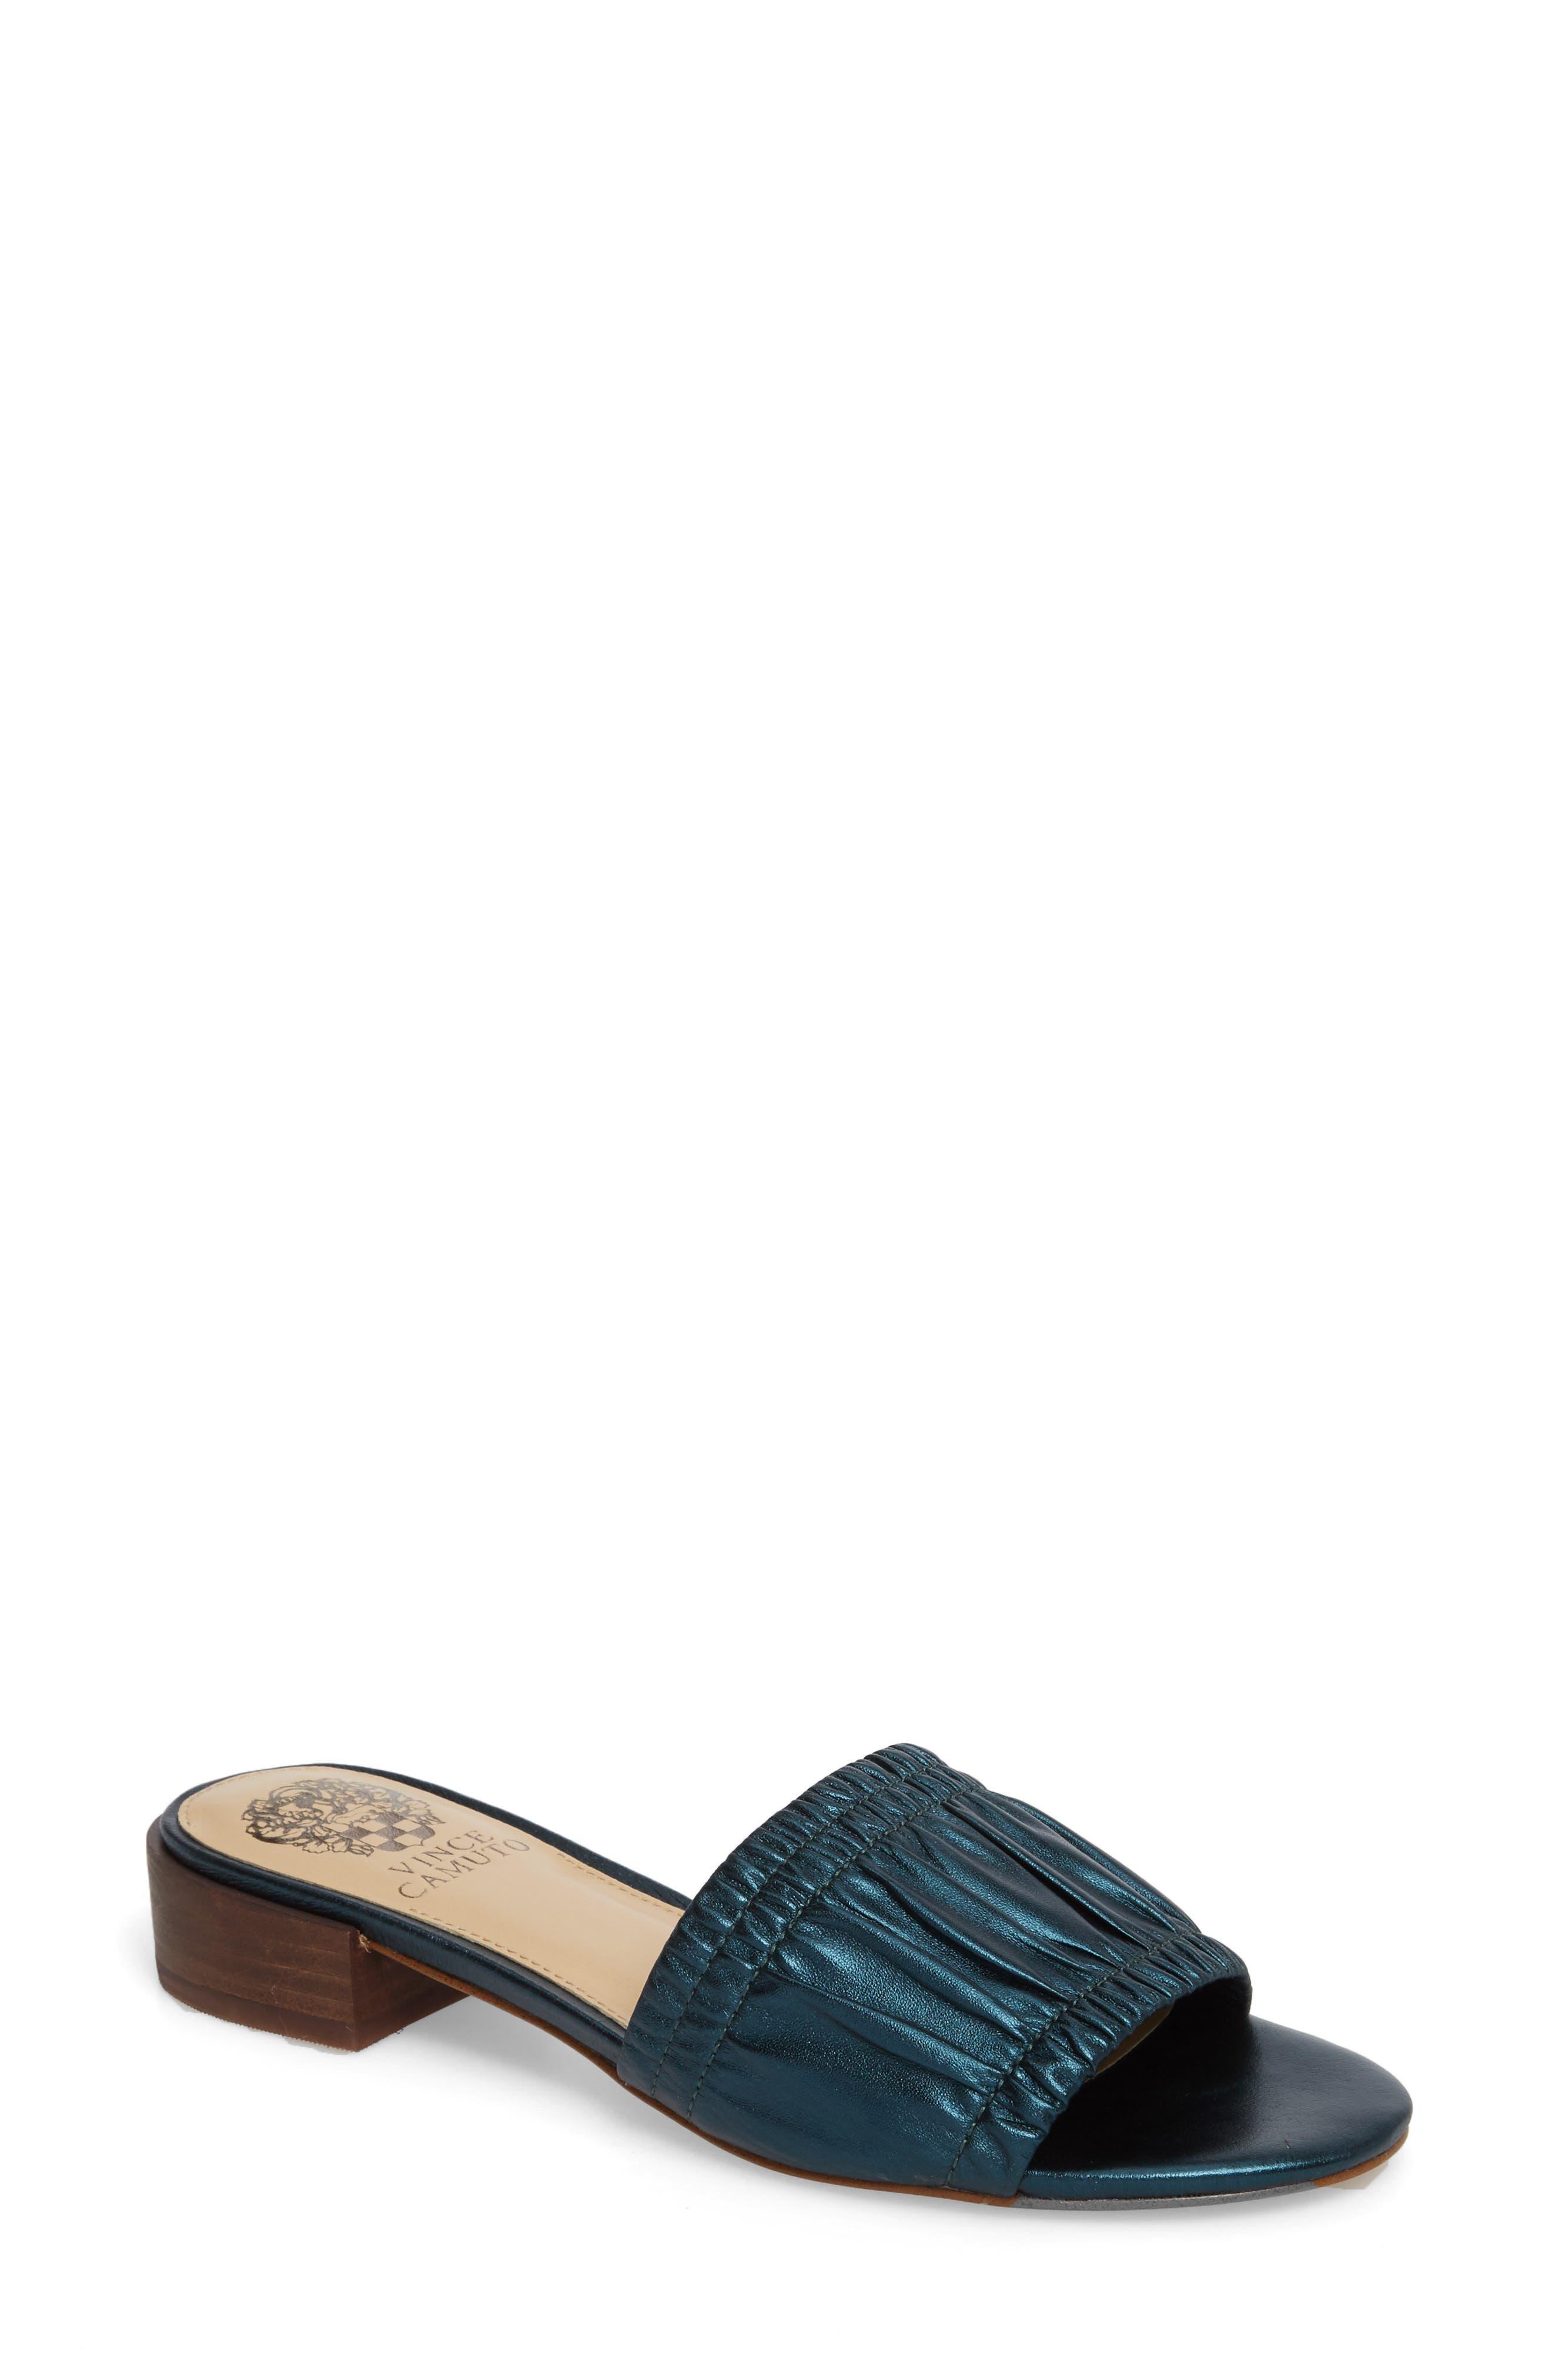 Nanita Pleated Slide Sandal,                         Main,                         color, Metal Teal Fabric